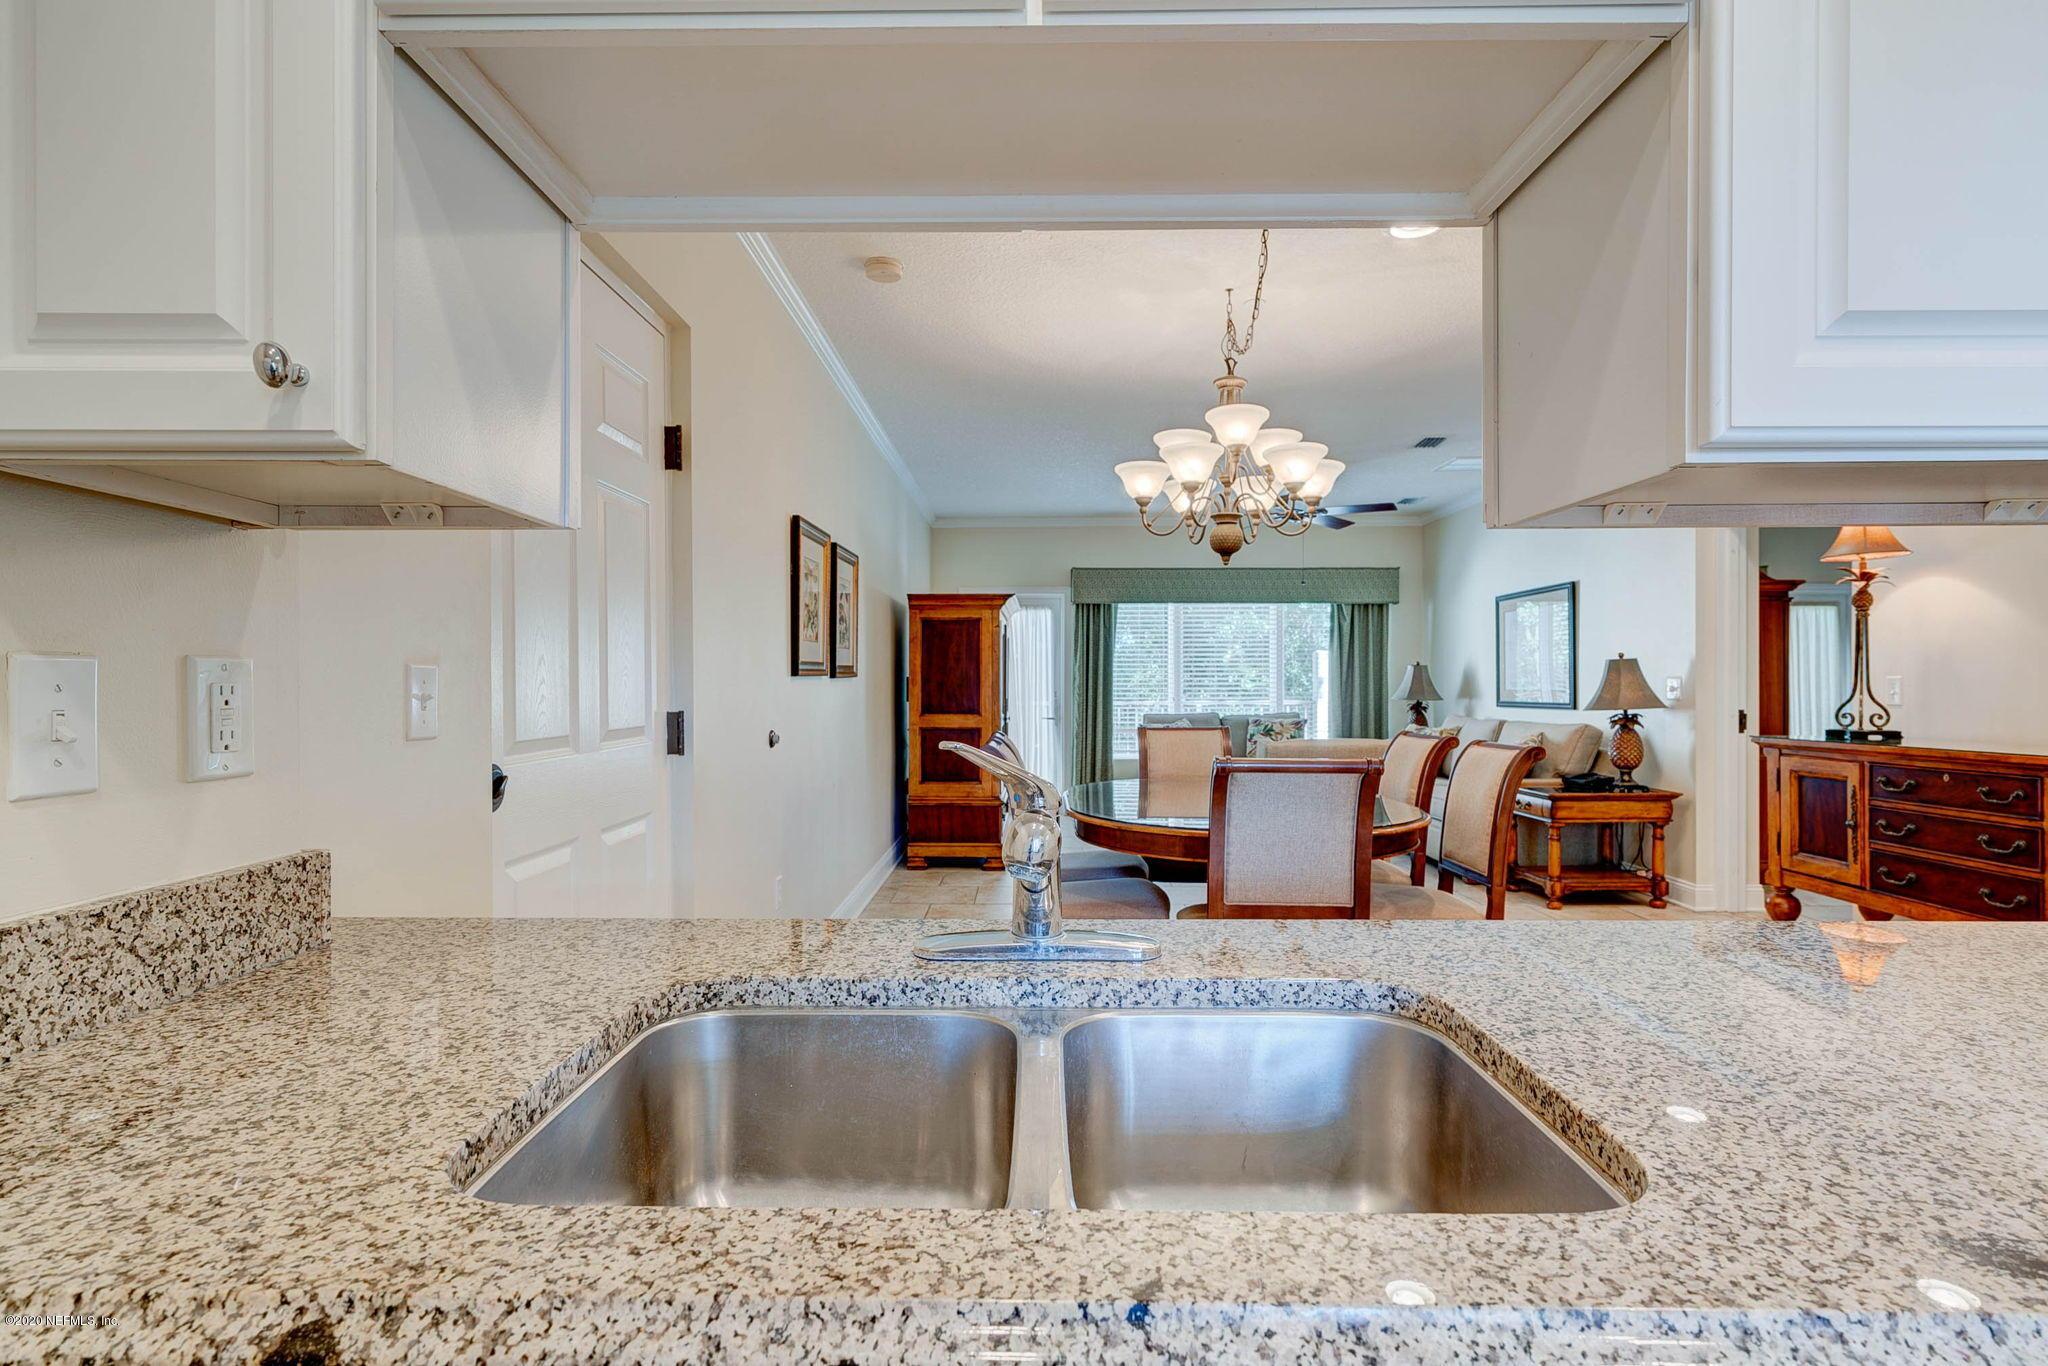 2531 BOXWOOD, FERNANDINA BEACH, FLORIDA 32034, 2 Bedrooms Bedrooms, ,2 BathroomsBathrooms,Residential,For sale,BOXWOOD,1082211